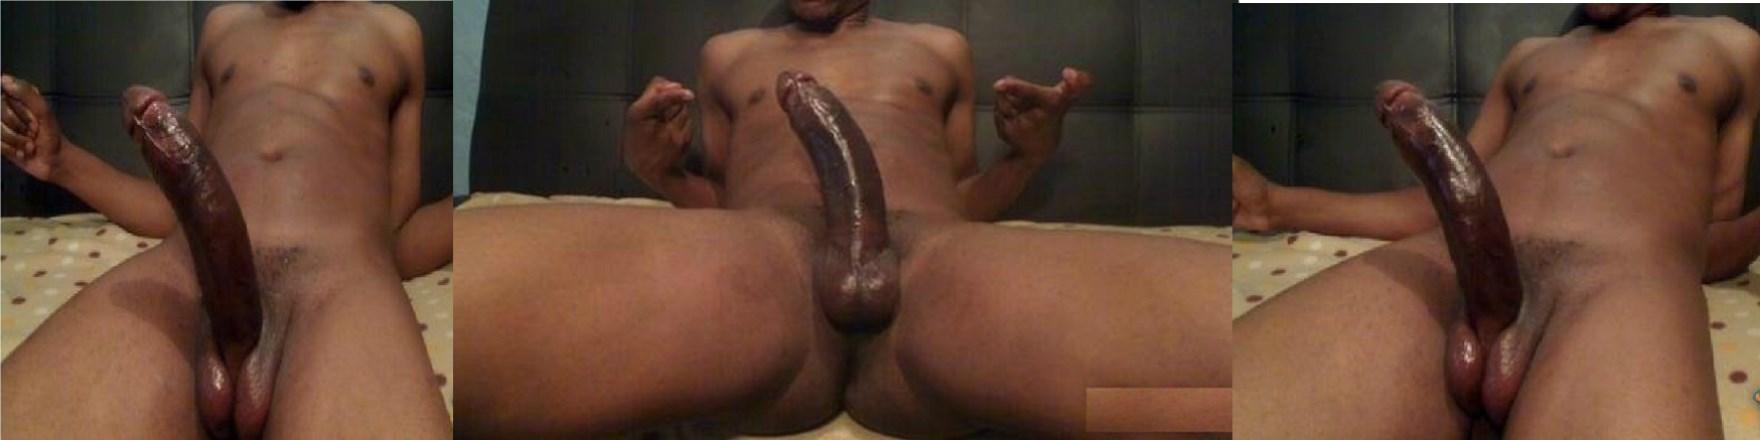 Big chocolate cock